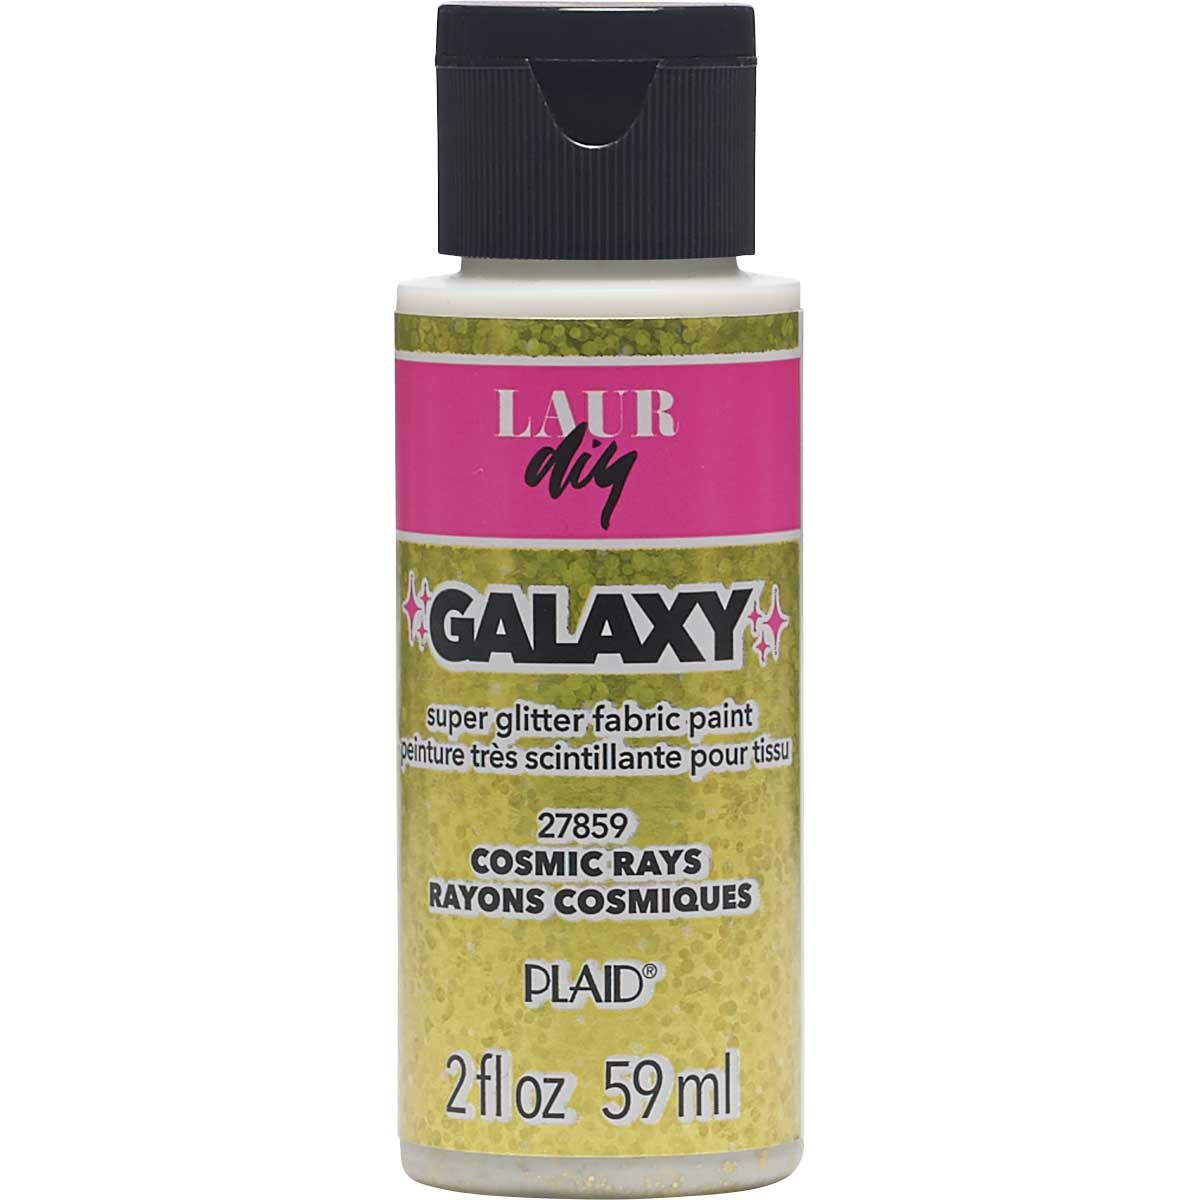 LaurDIY ® Galaxy Glitter Fabric Paint - Cosmic Rays, 2 oz.